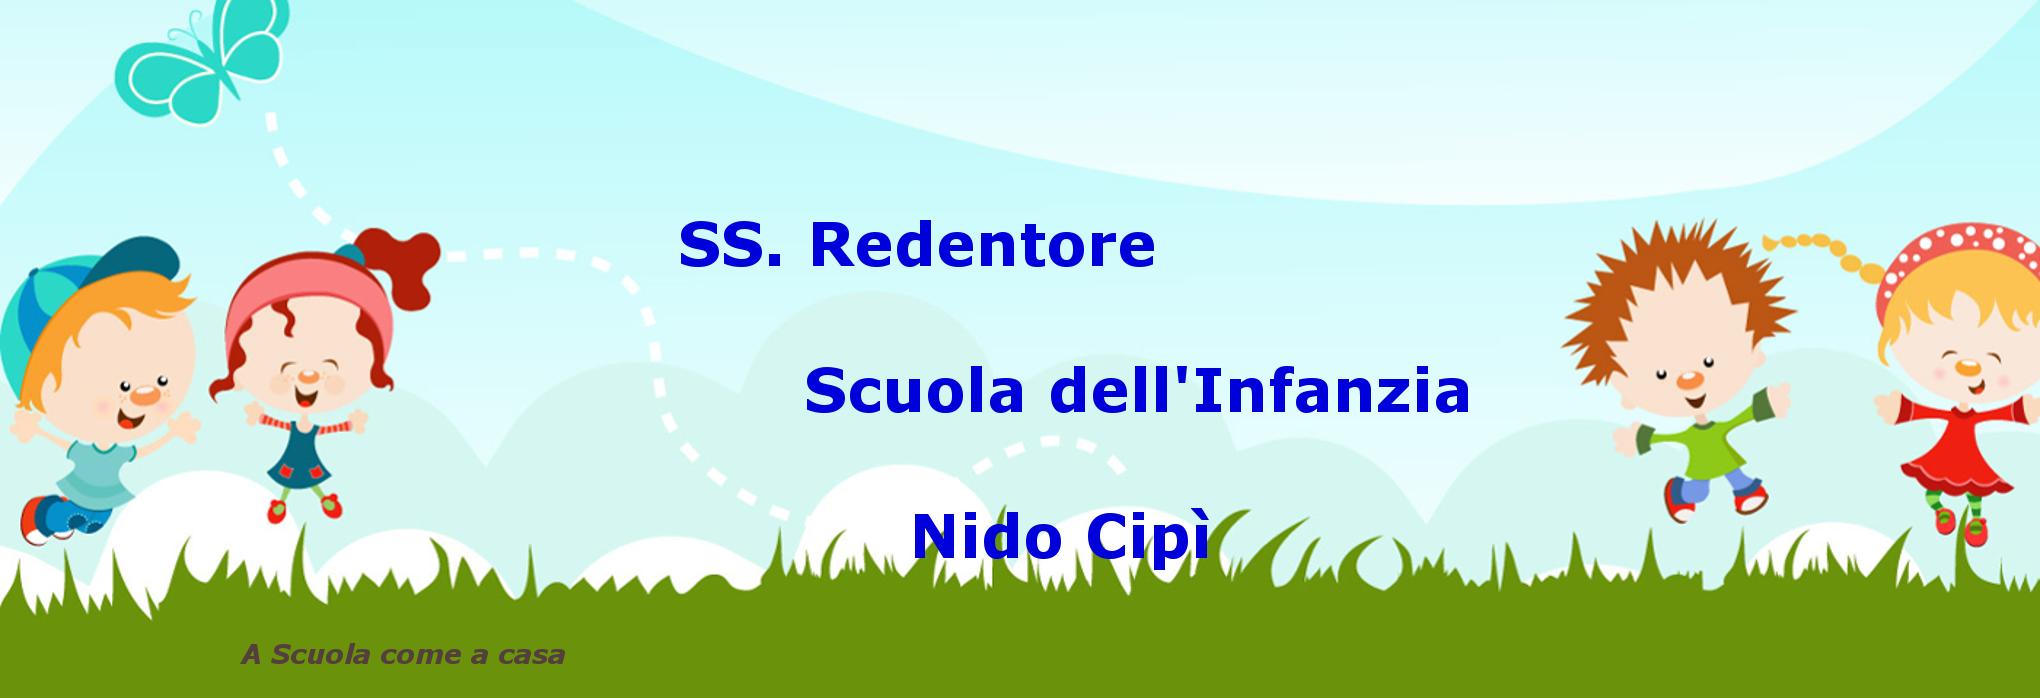 Calendario Scuola Infanzia.Calendario Scuola Dell Infanzia Novedrate E Nido Cipi